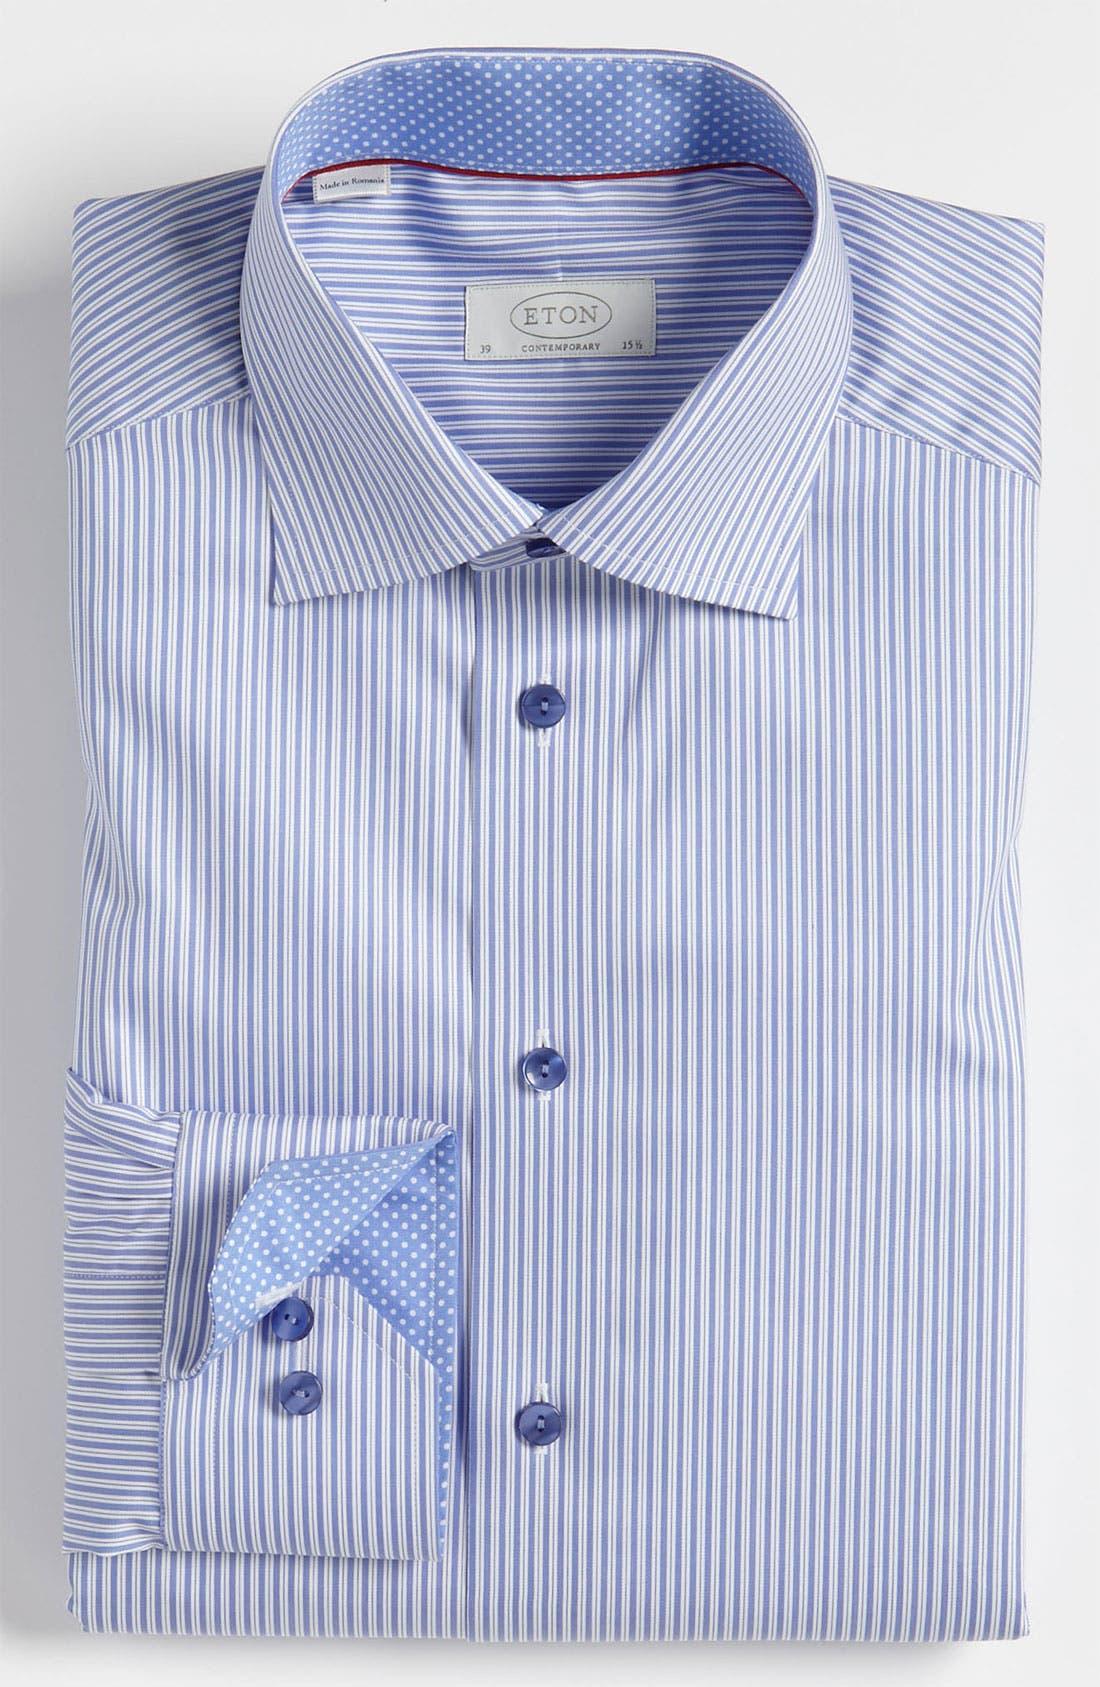 Alternate Image 1 Selected - Eton Contemporary Fit Dress Shirt